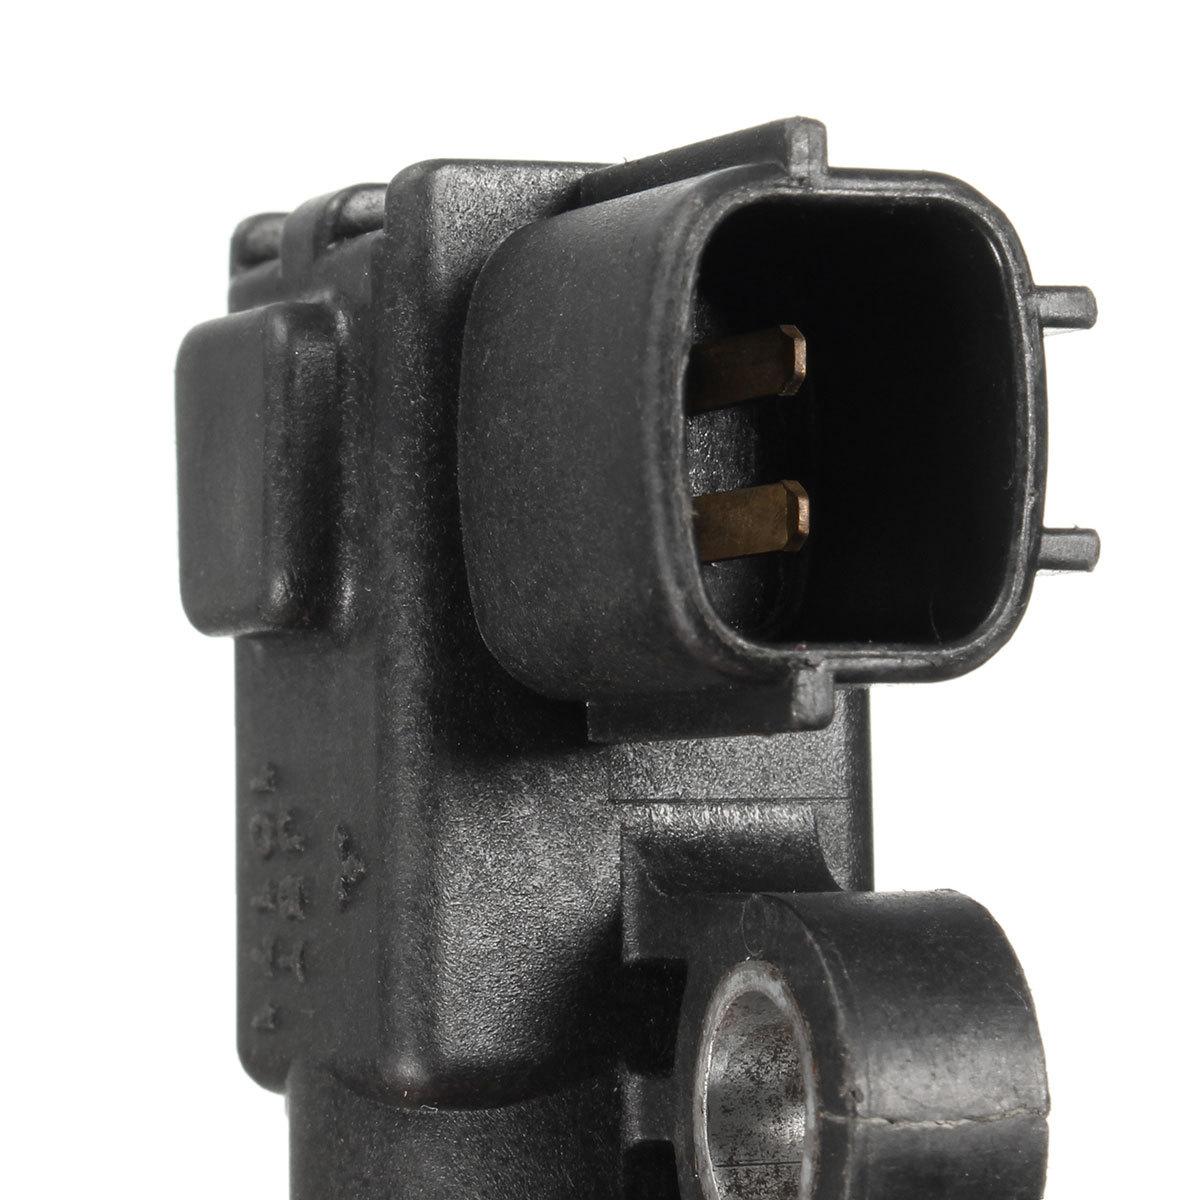 1995 Nissan Maxima Camshaft: Passenger Right Side Crankshaft Position Sensor For Nissan